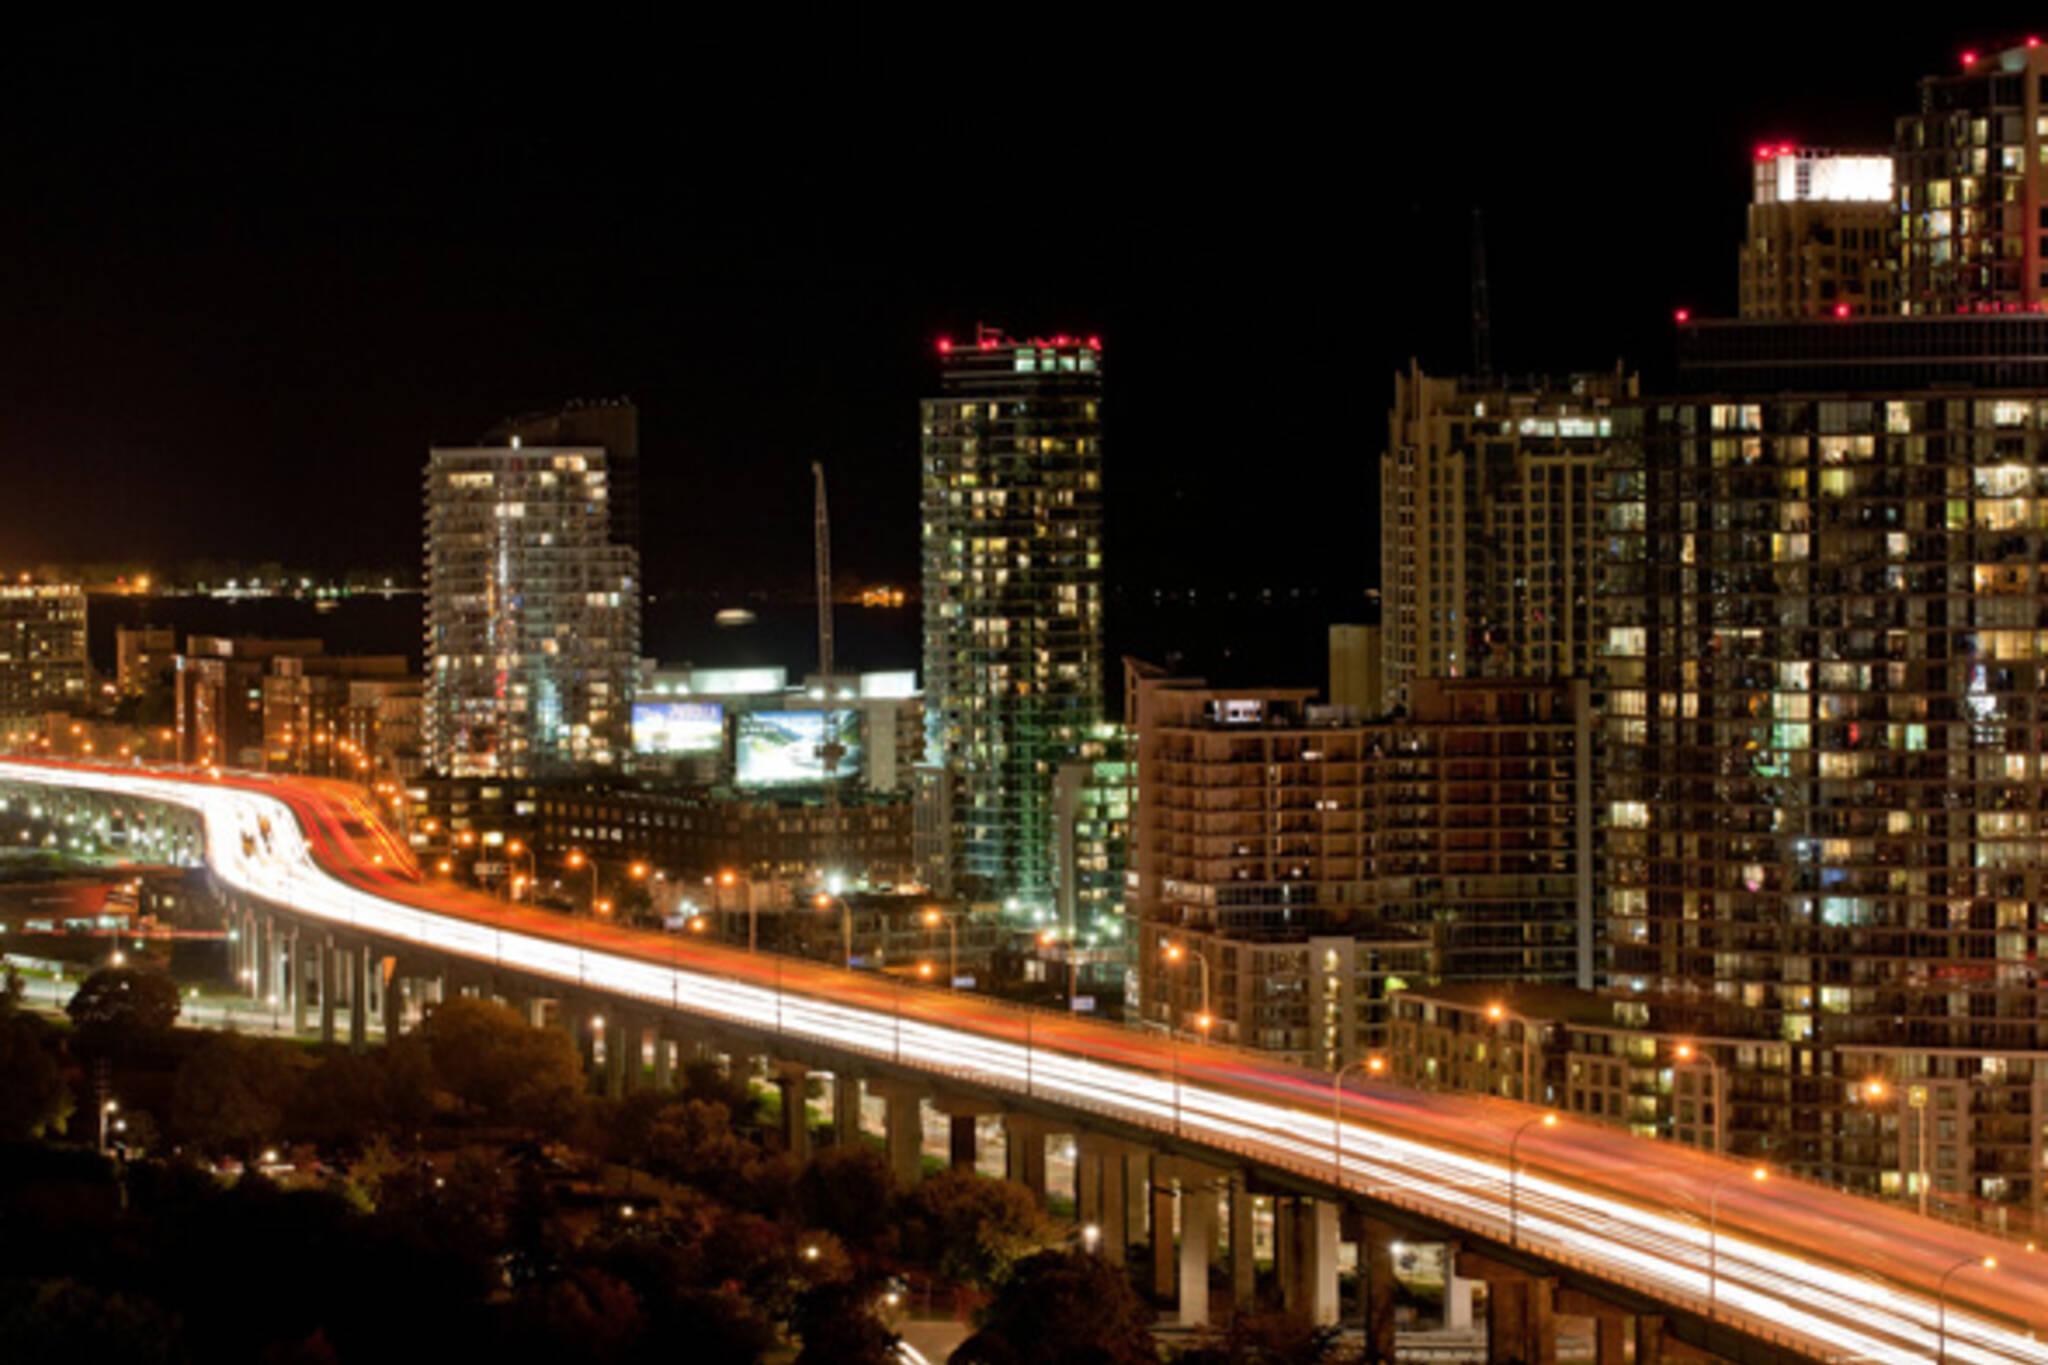 Gardiner Expressway, night